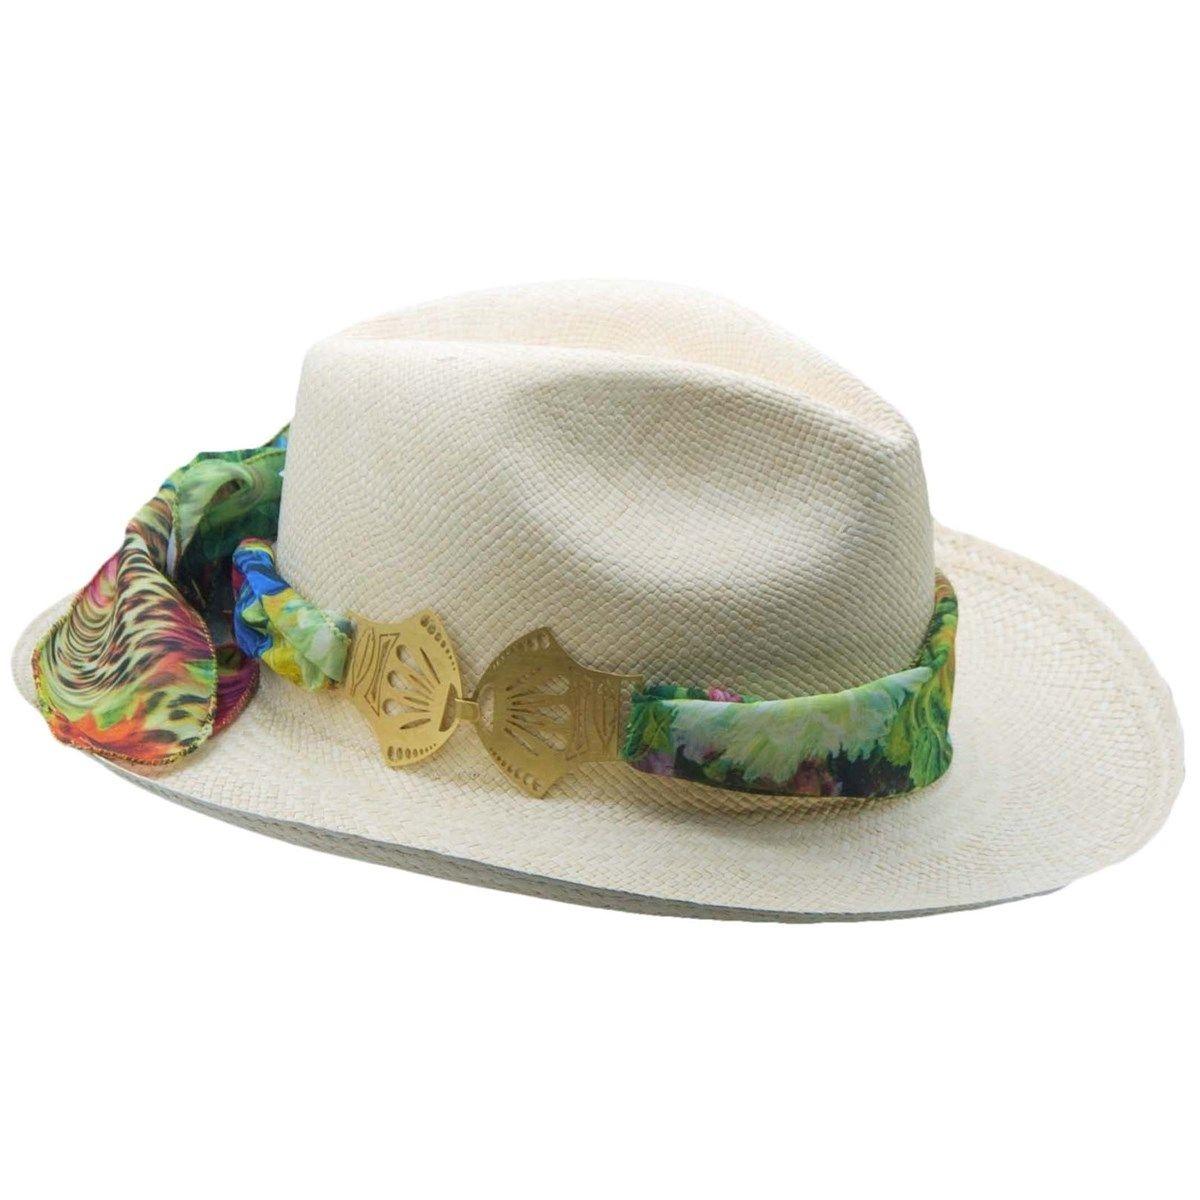 Chapeau panama en paille écru ruban interchangeable Foulard